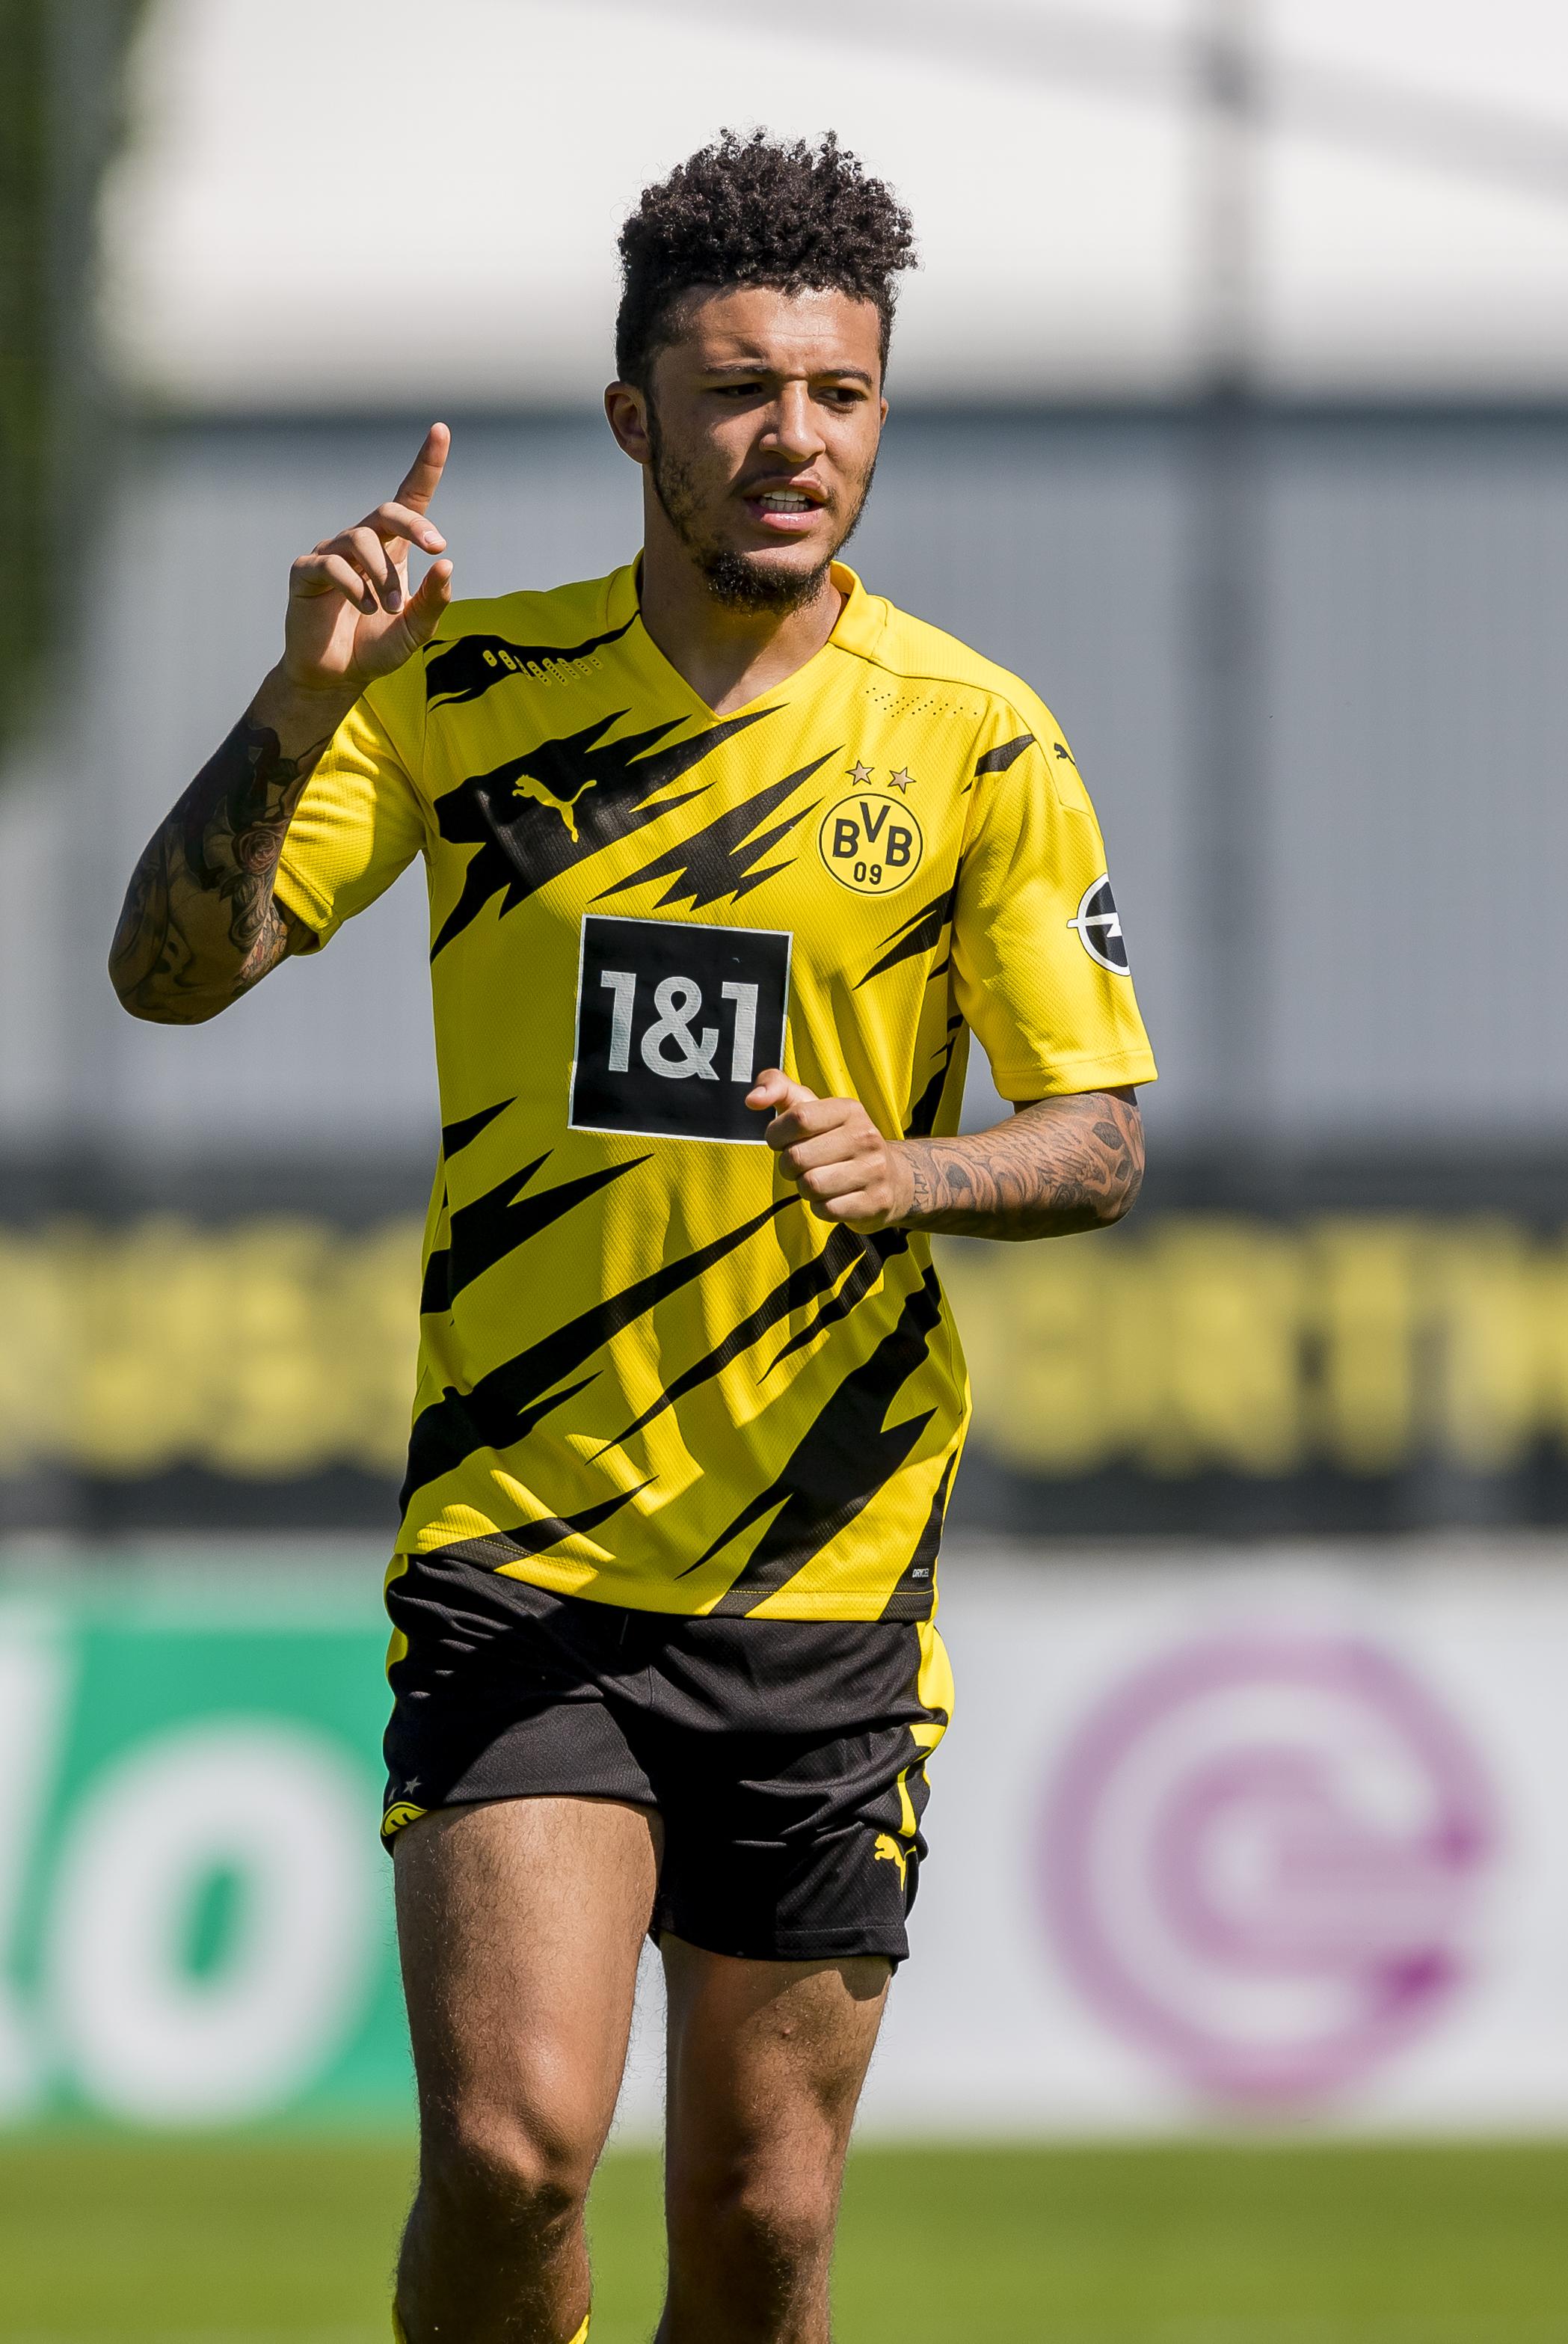 Borussia Dortmund New Kit Single Player Action